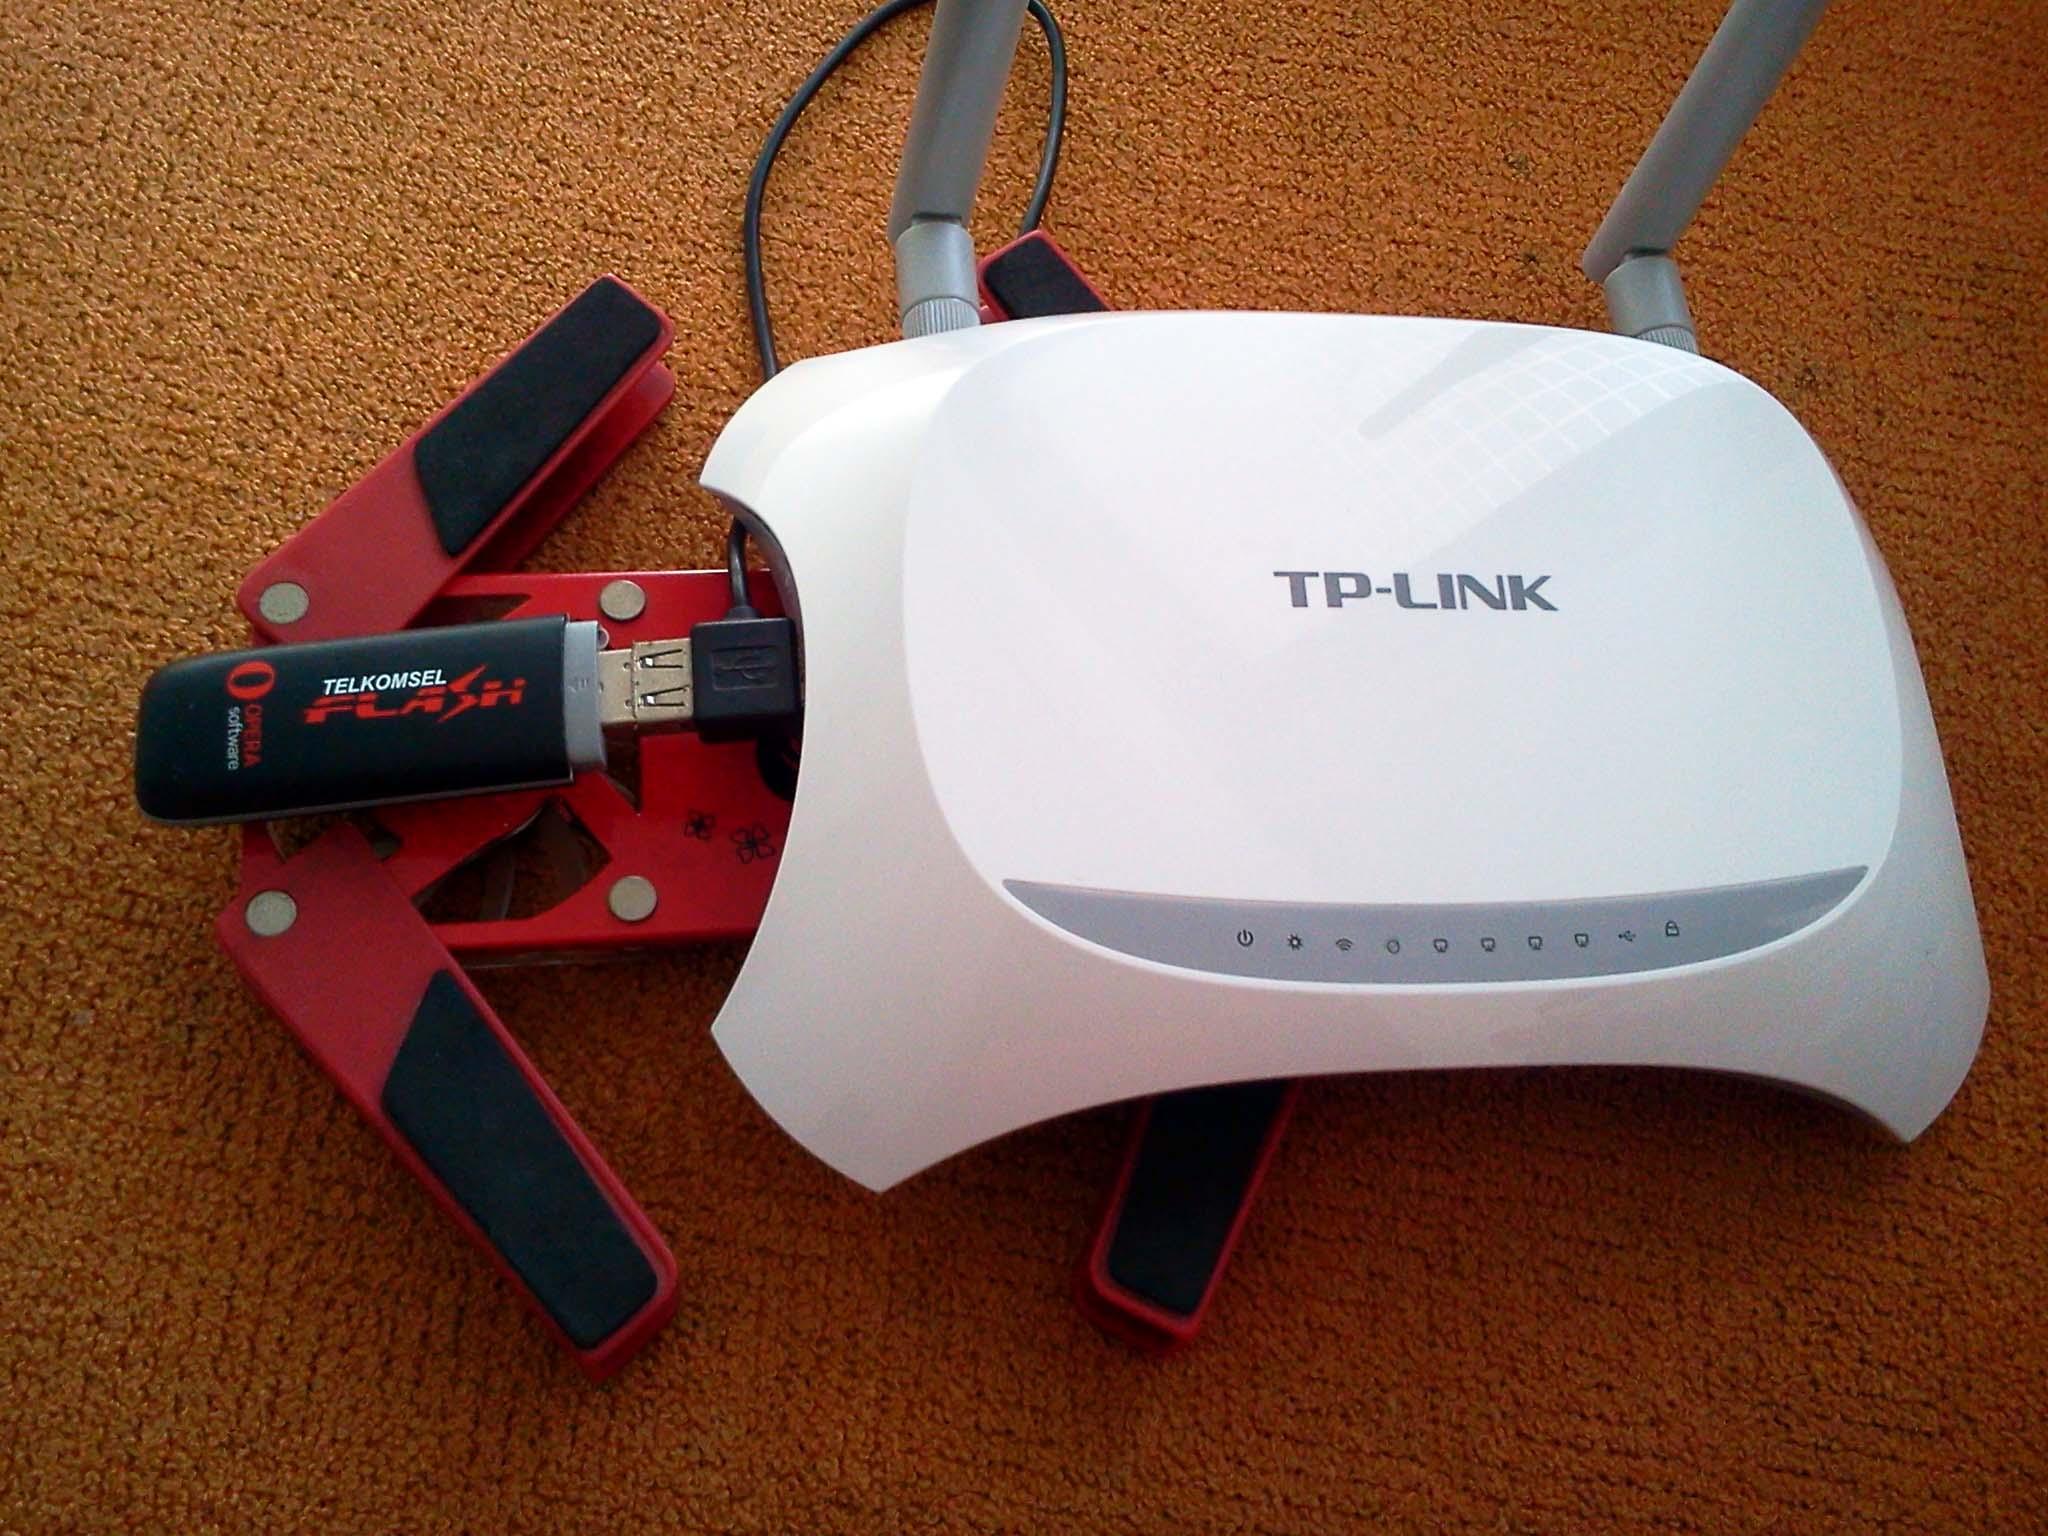 Rangkaian Router Wi Fi 3G Modem USB Dan Kipas Dites Menyala 1x24 Jam Hasilnya Tetap Adem Koneksi Pun Lancar Jaya